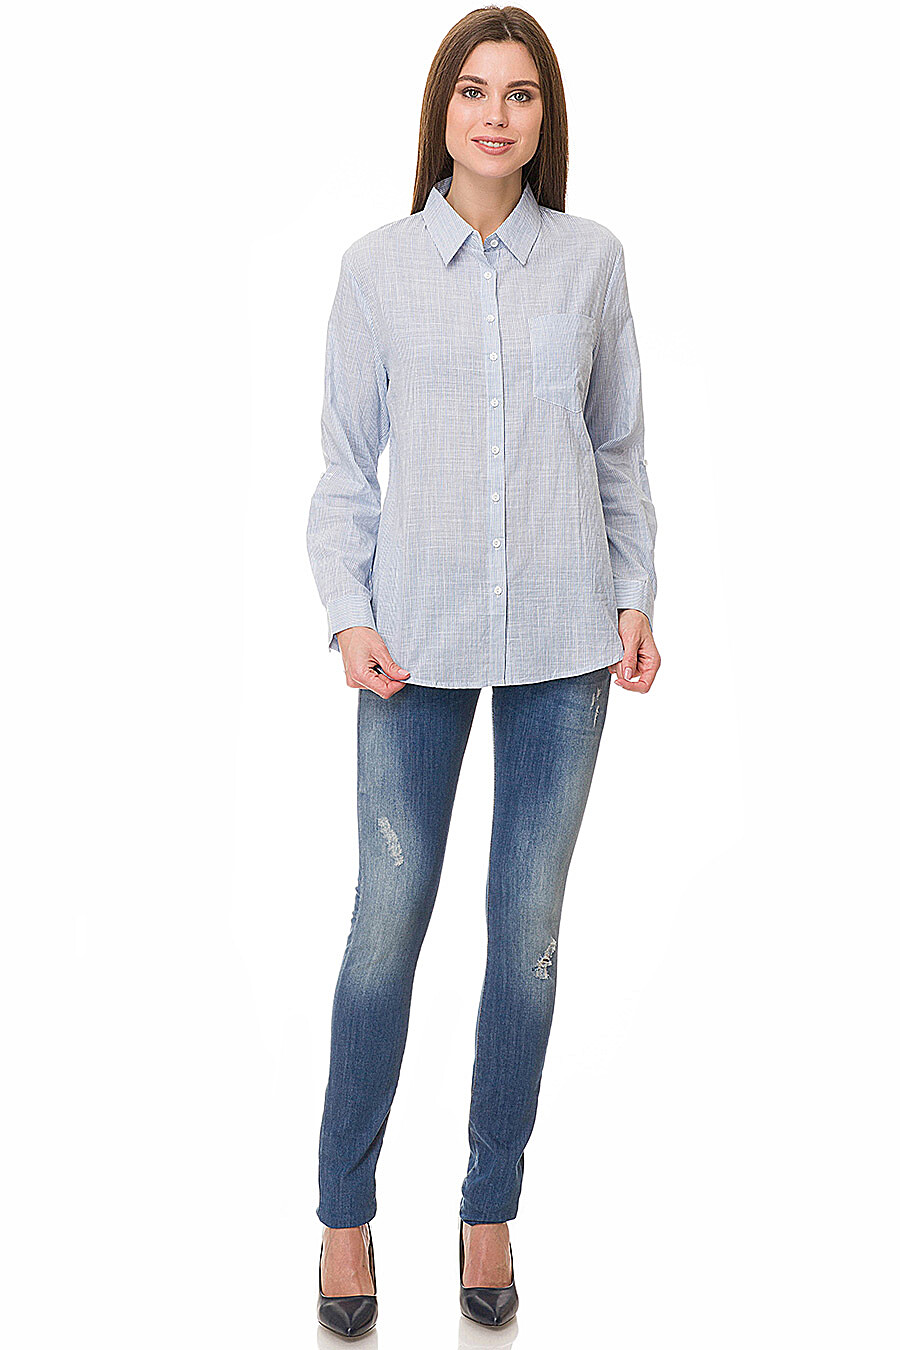 Рубашка MODALIME (89384), купить в Moyo.moda